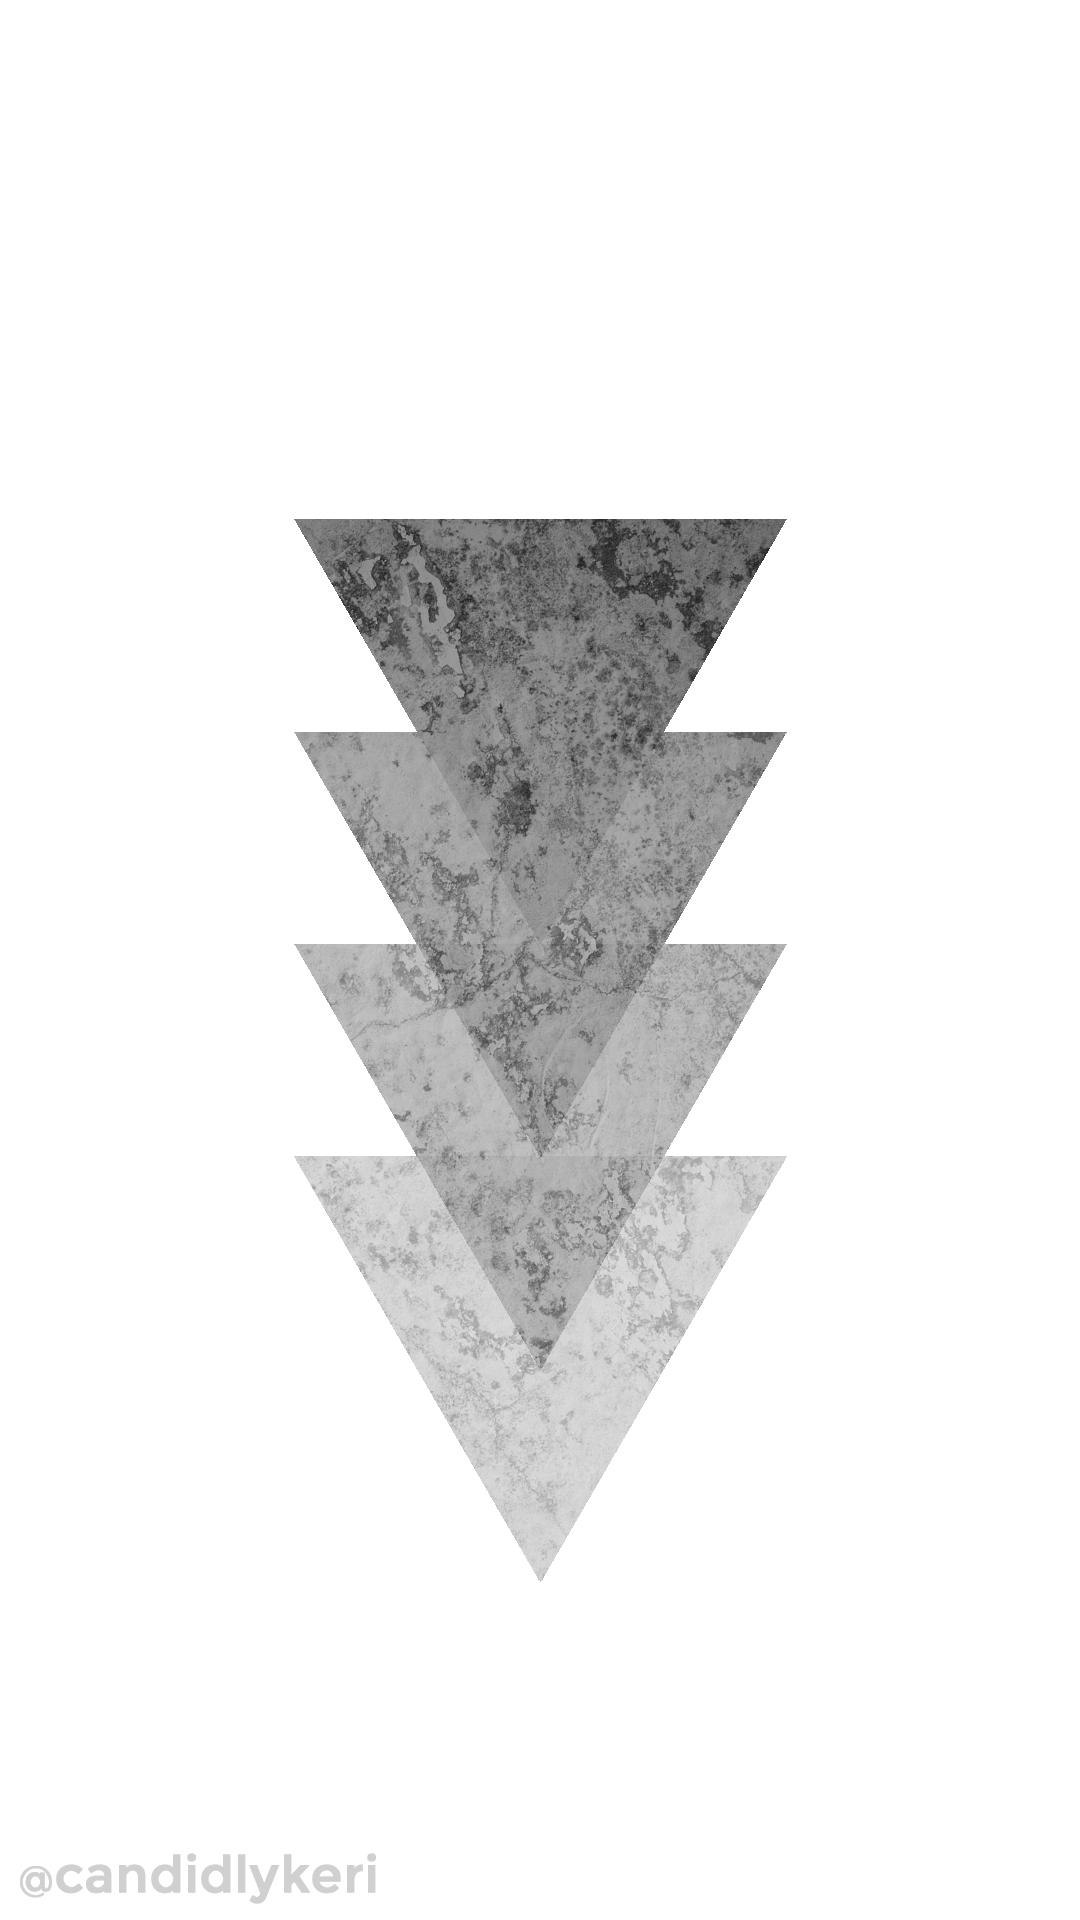 badcfebeebfab-wallpaper-wpc5802451